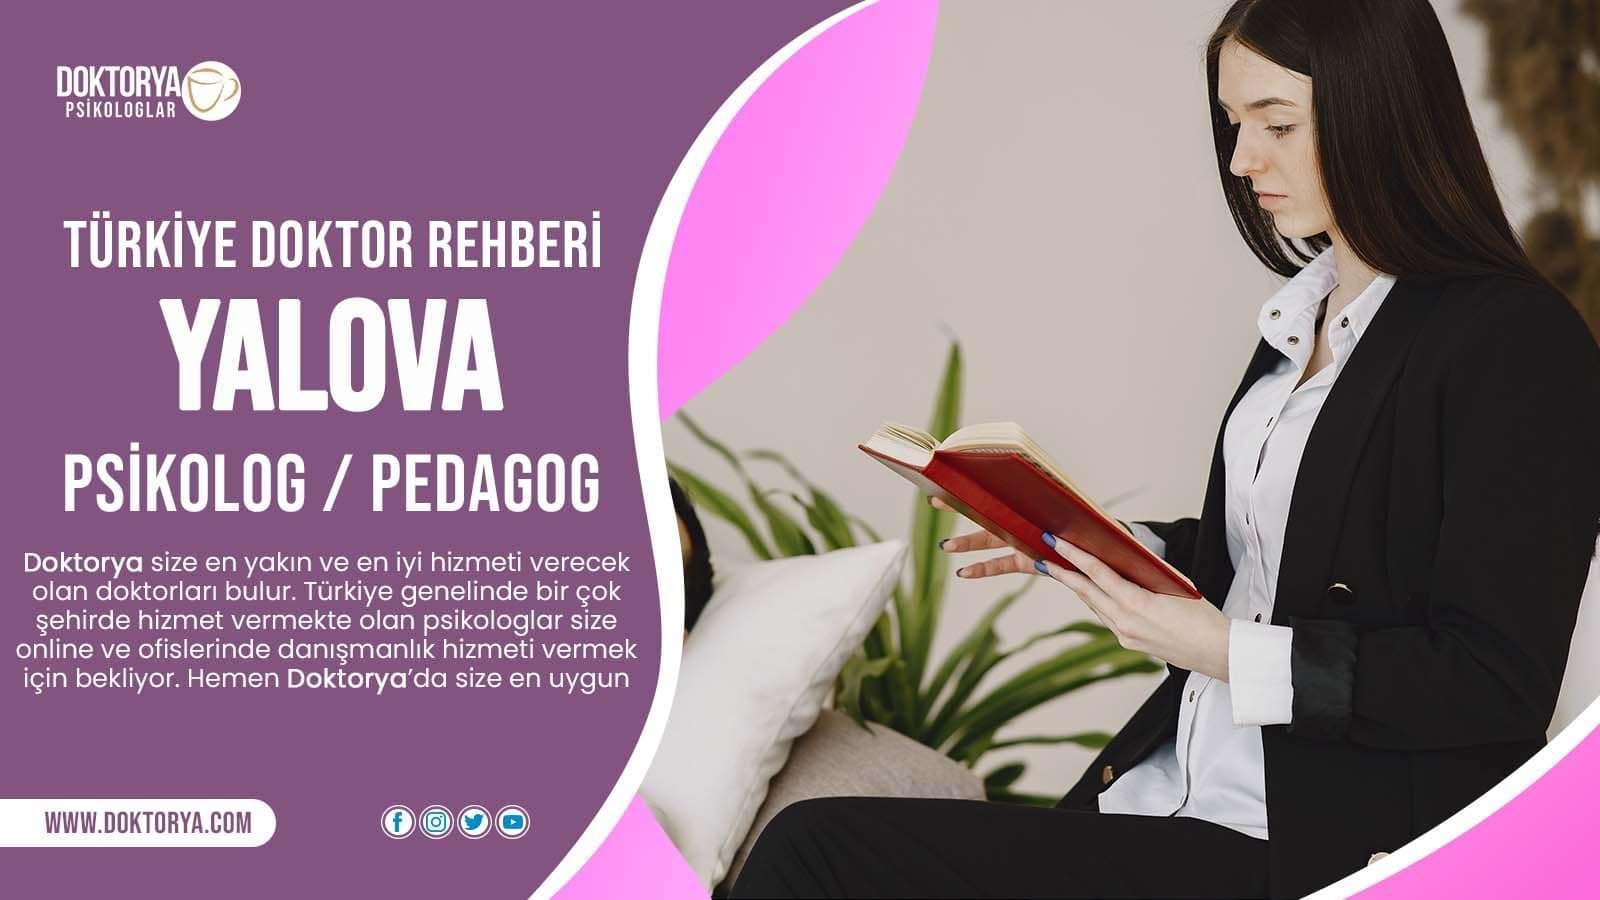 Yalova Psikolog